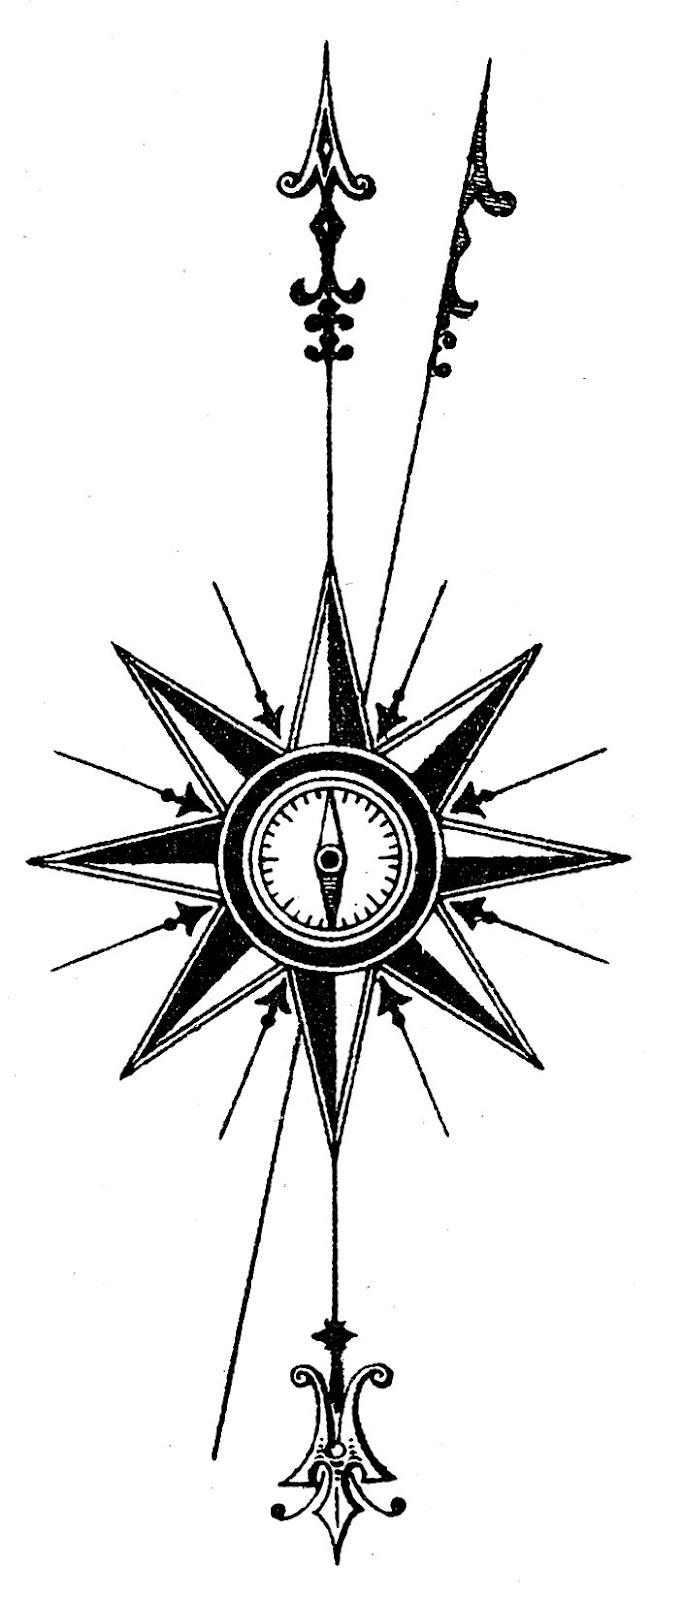 East clipart old compass Rose Art Clip Vintage Art